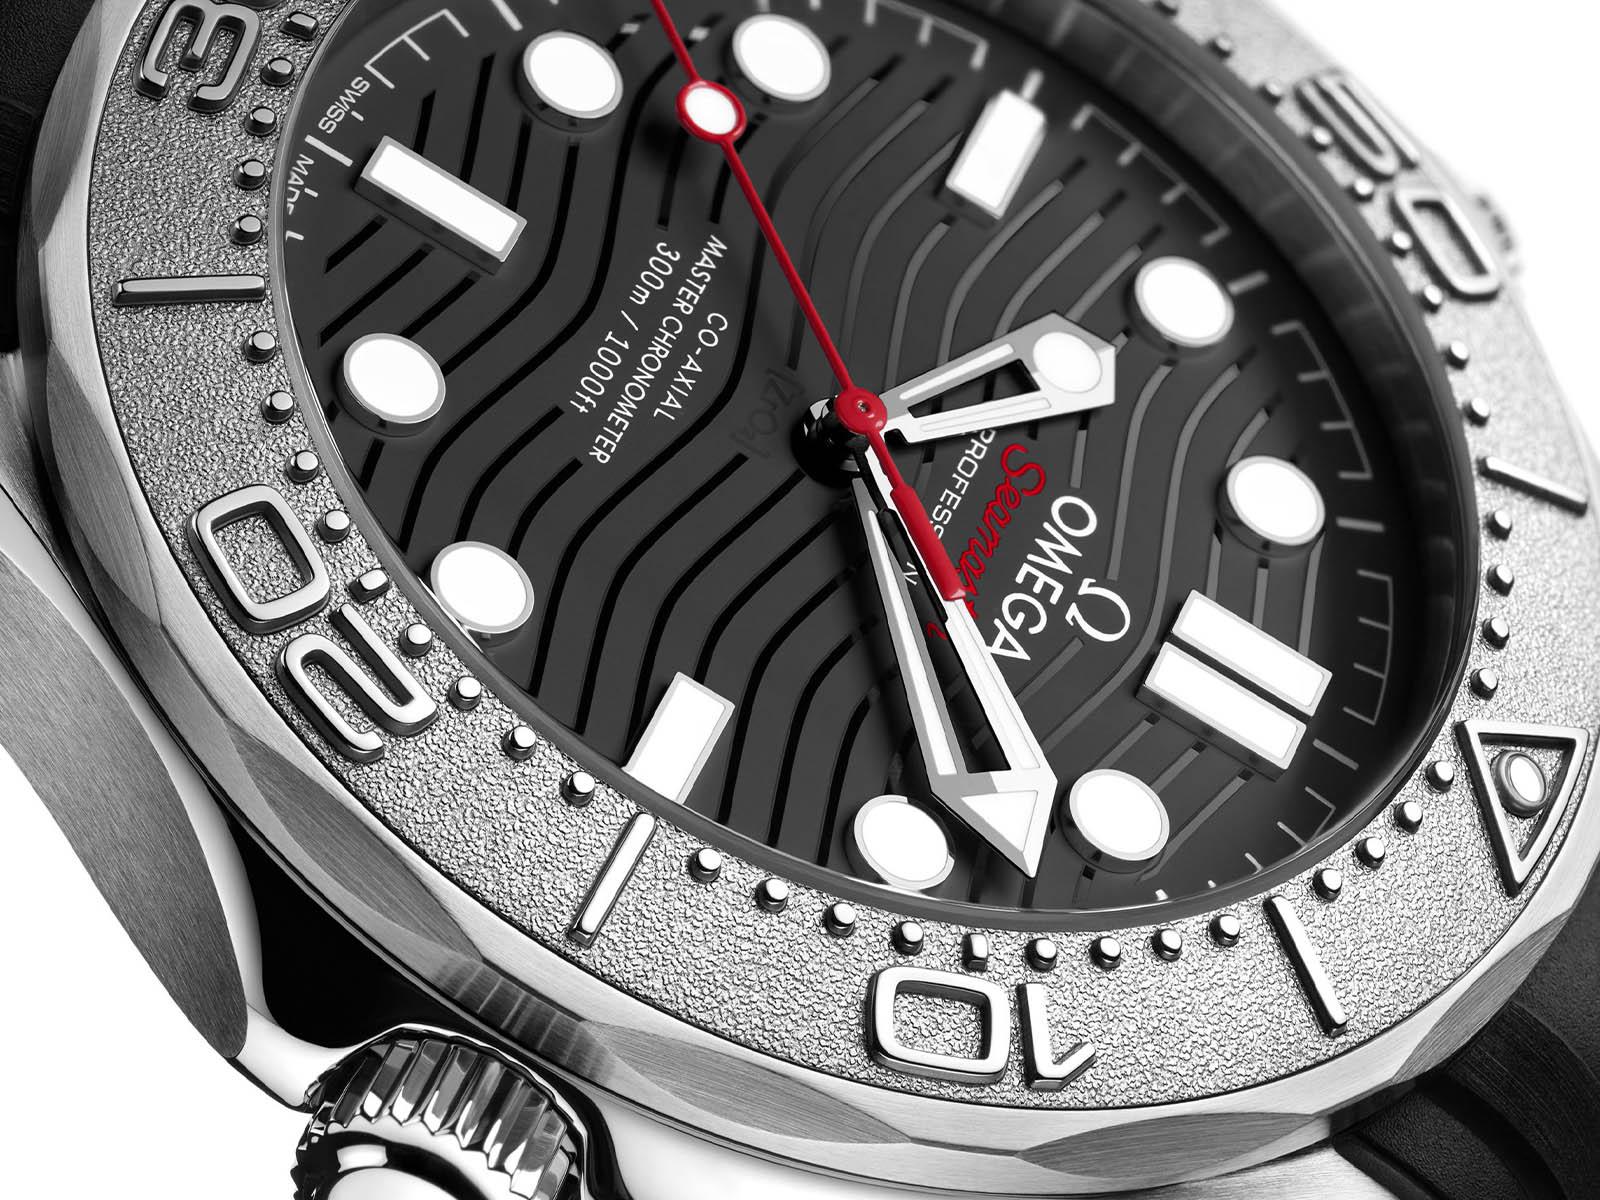 210-32-42-20-01-002-omega-seamaster-diver-300m-nekton-edition-4.jpg